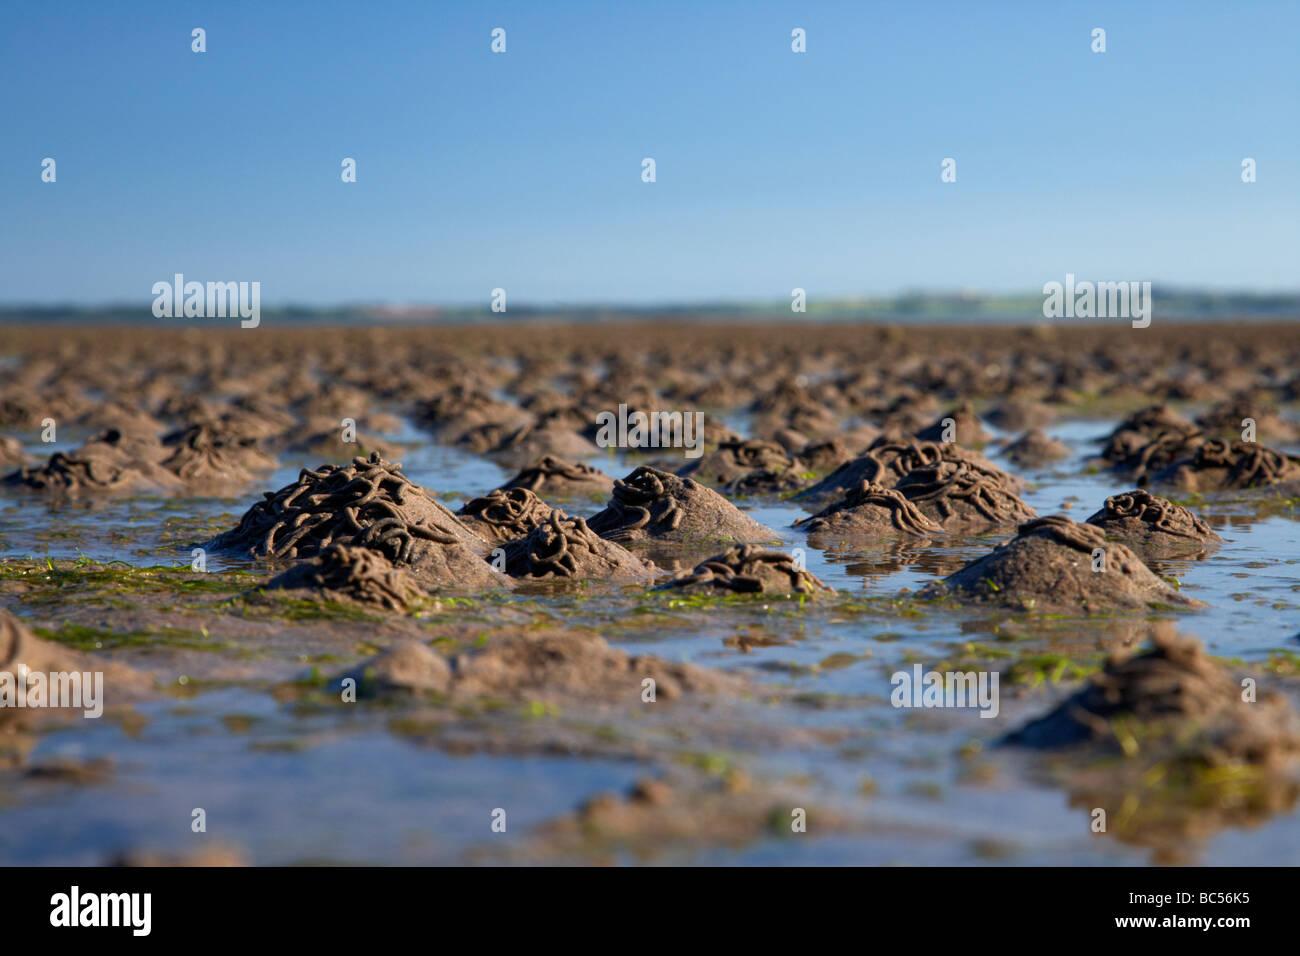 lugworm arenicola marina casts on mudflats in strangford lough county down northern ireland uk - Stock Image